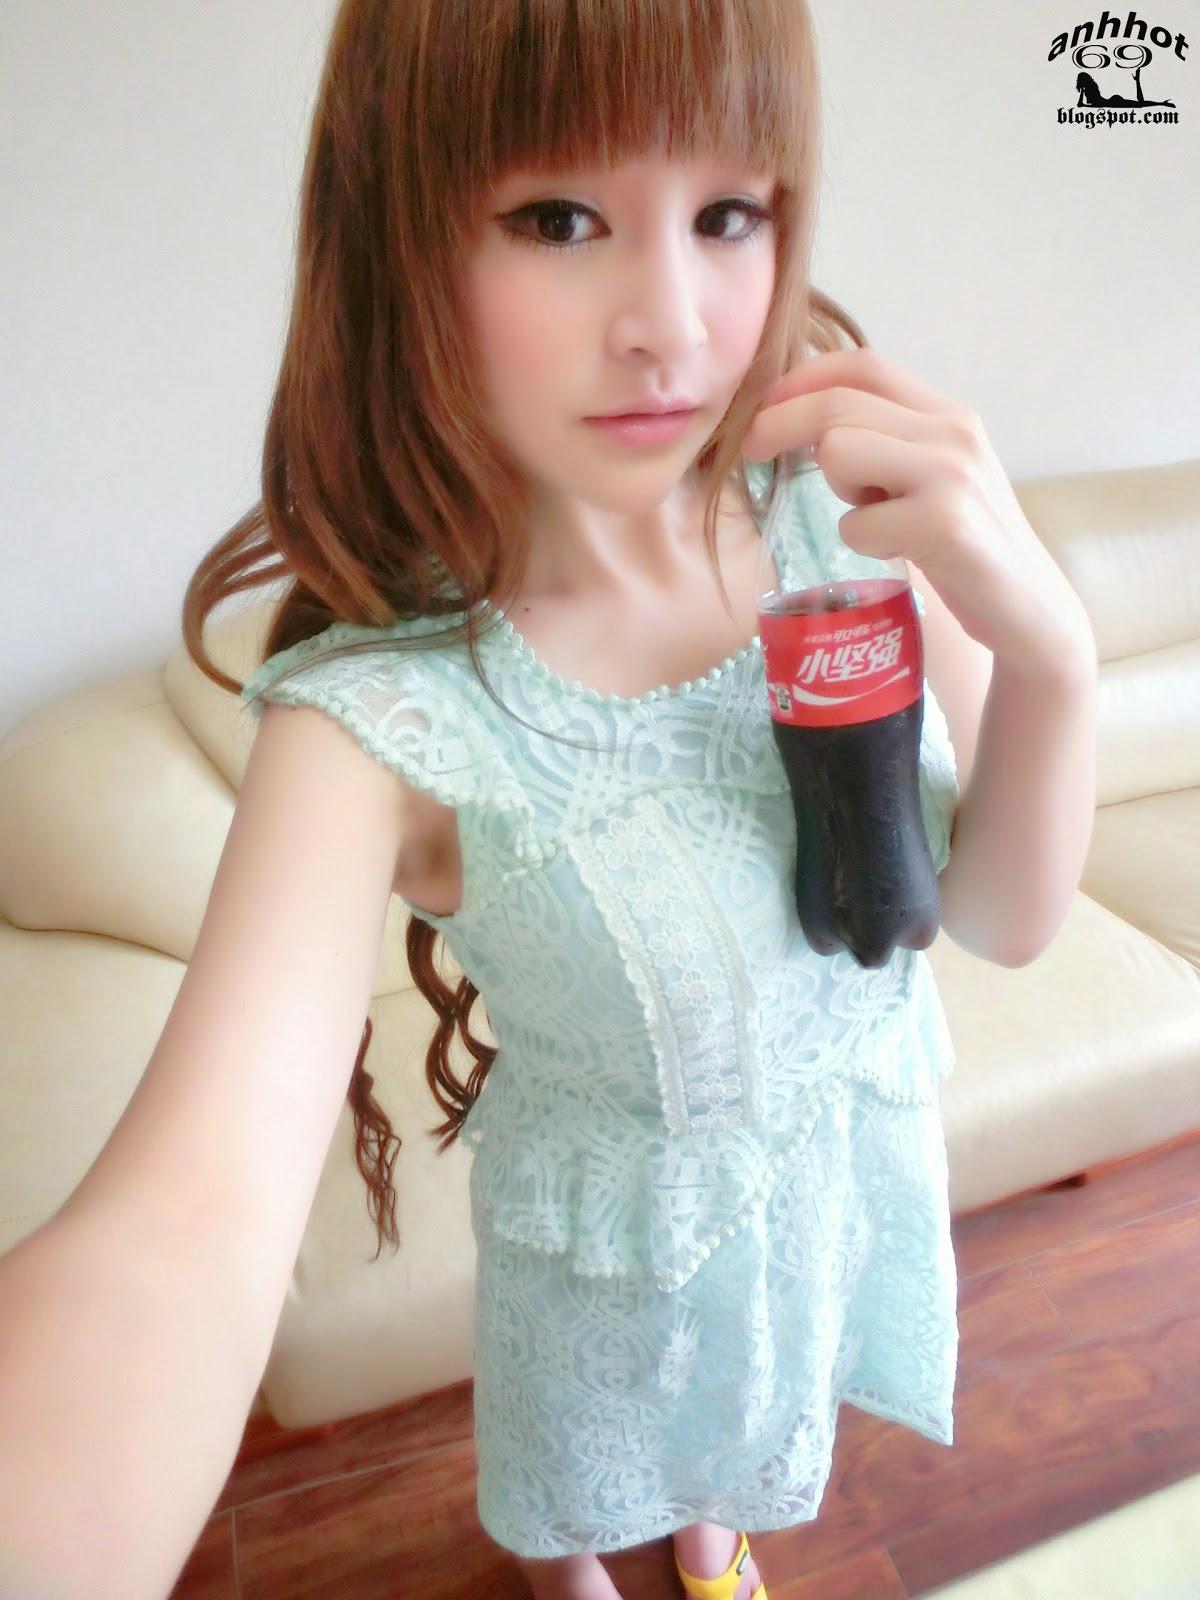 Suxia_h8_11743326521af5cc16o